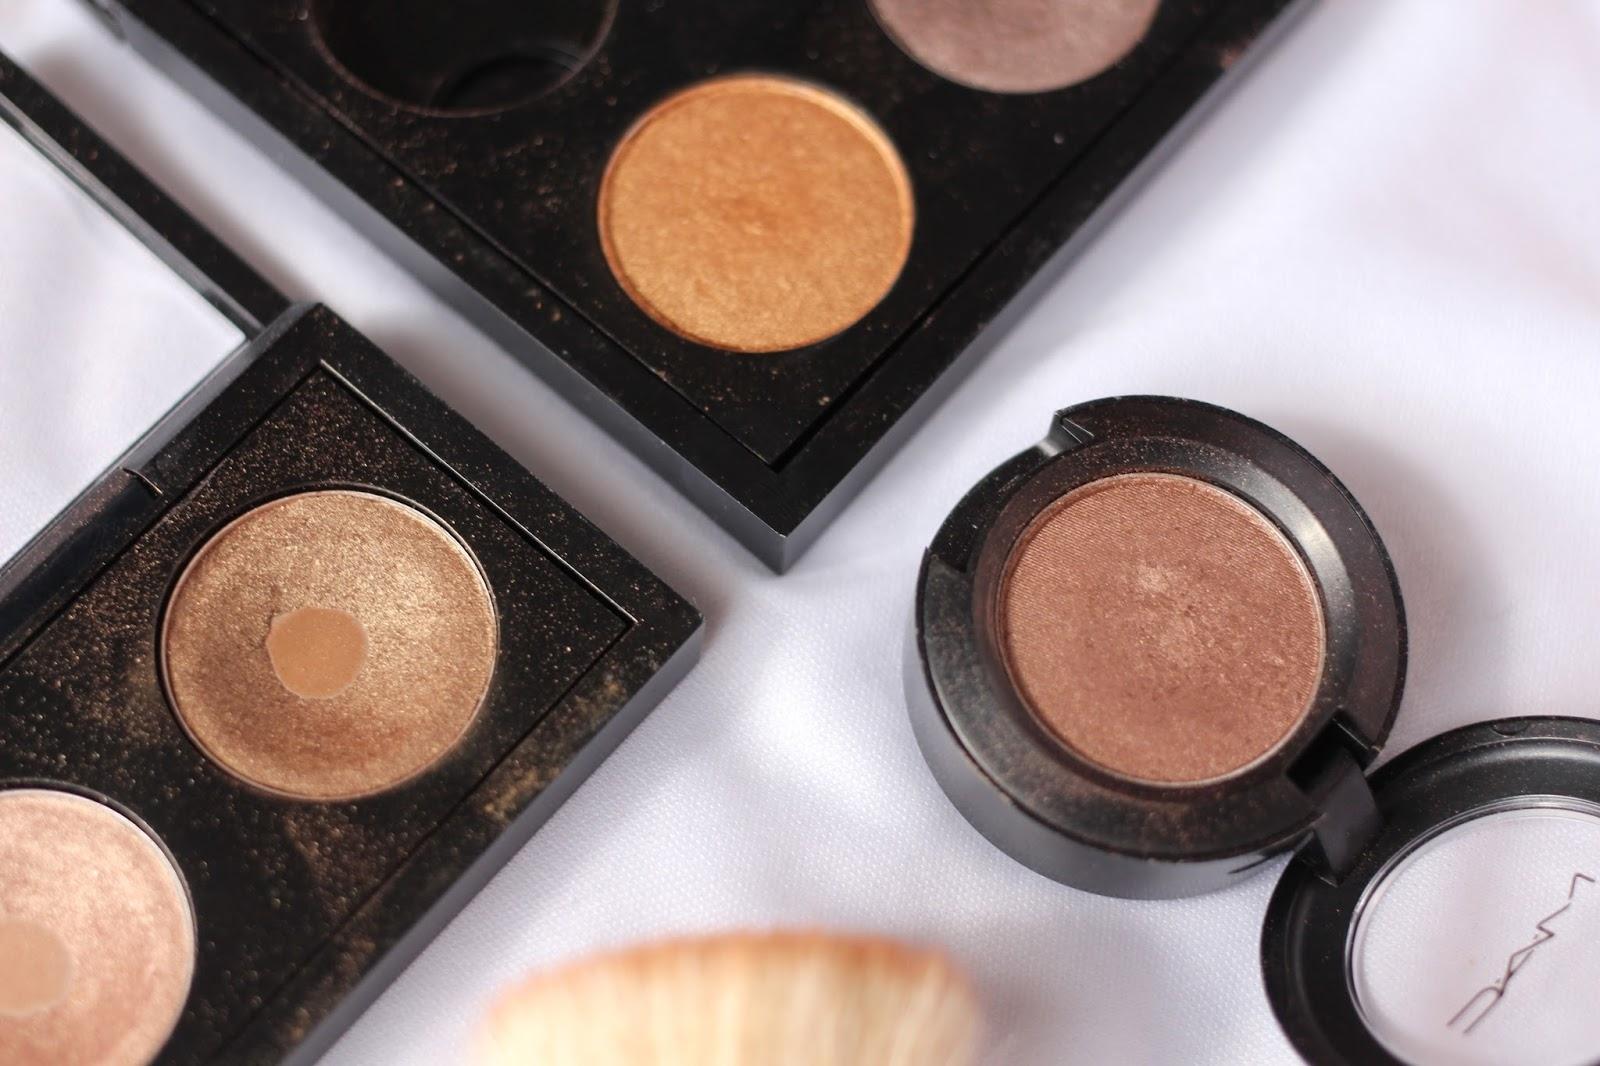 Top Mac Eyeshadows For Green Eyes. Eyeshadow Addicts Anonymous: Top inside Mac Brown Eyeshadows For Green Eyes